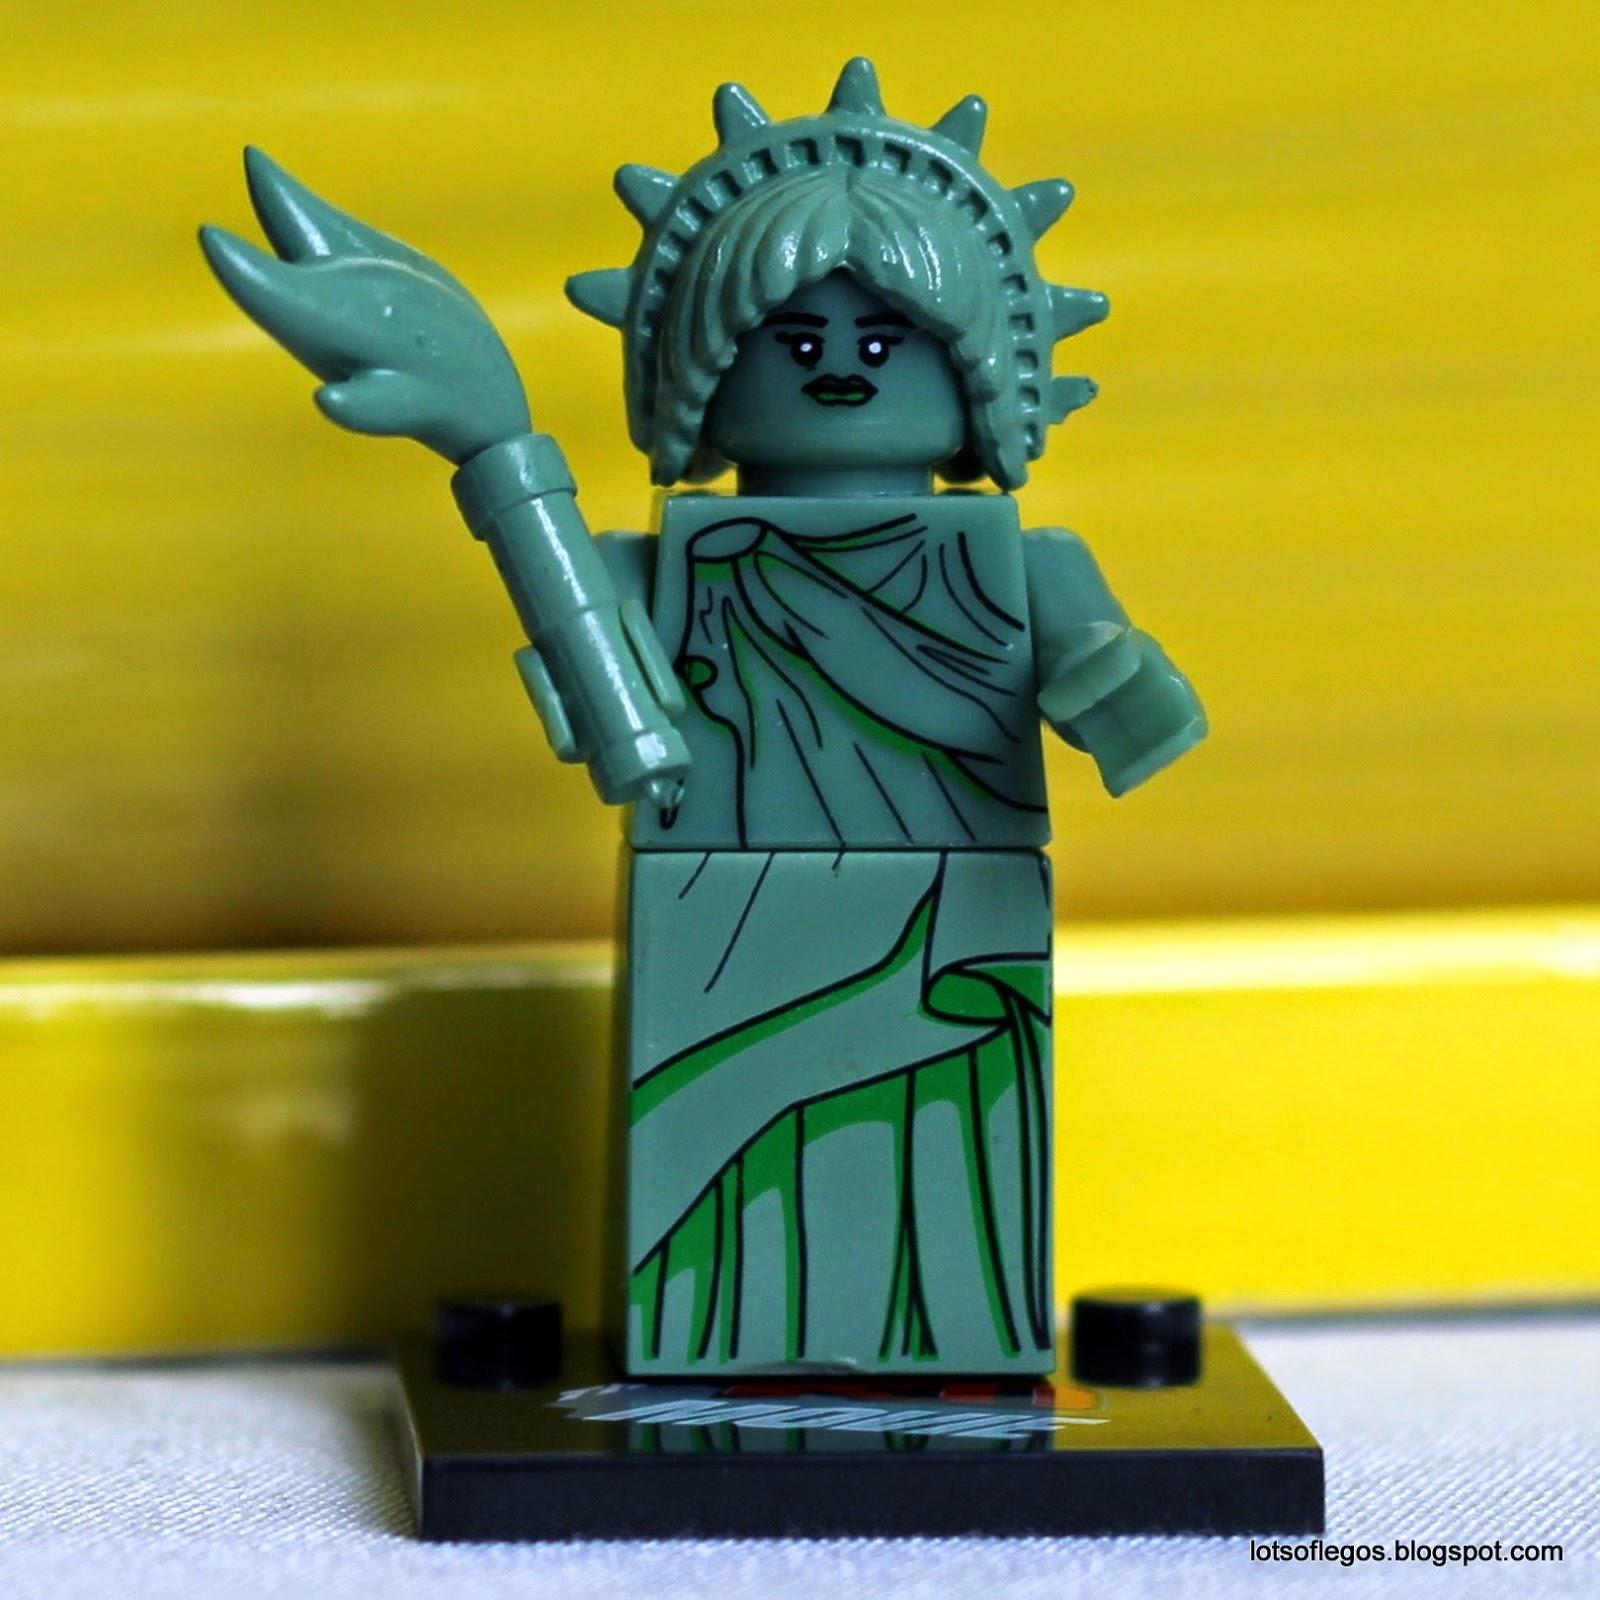 Unikitty Lego Set Bricks And Figures: Le...